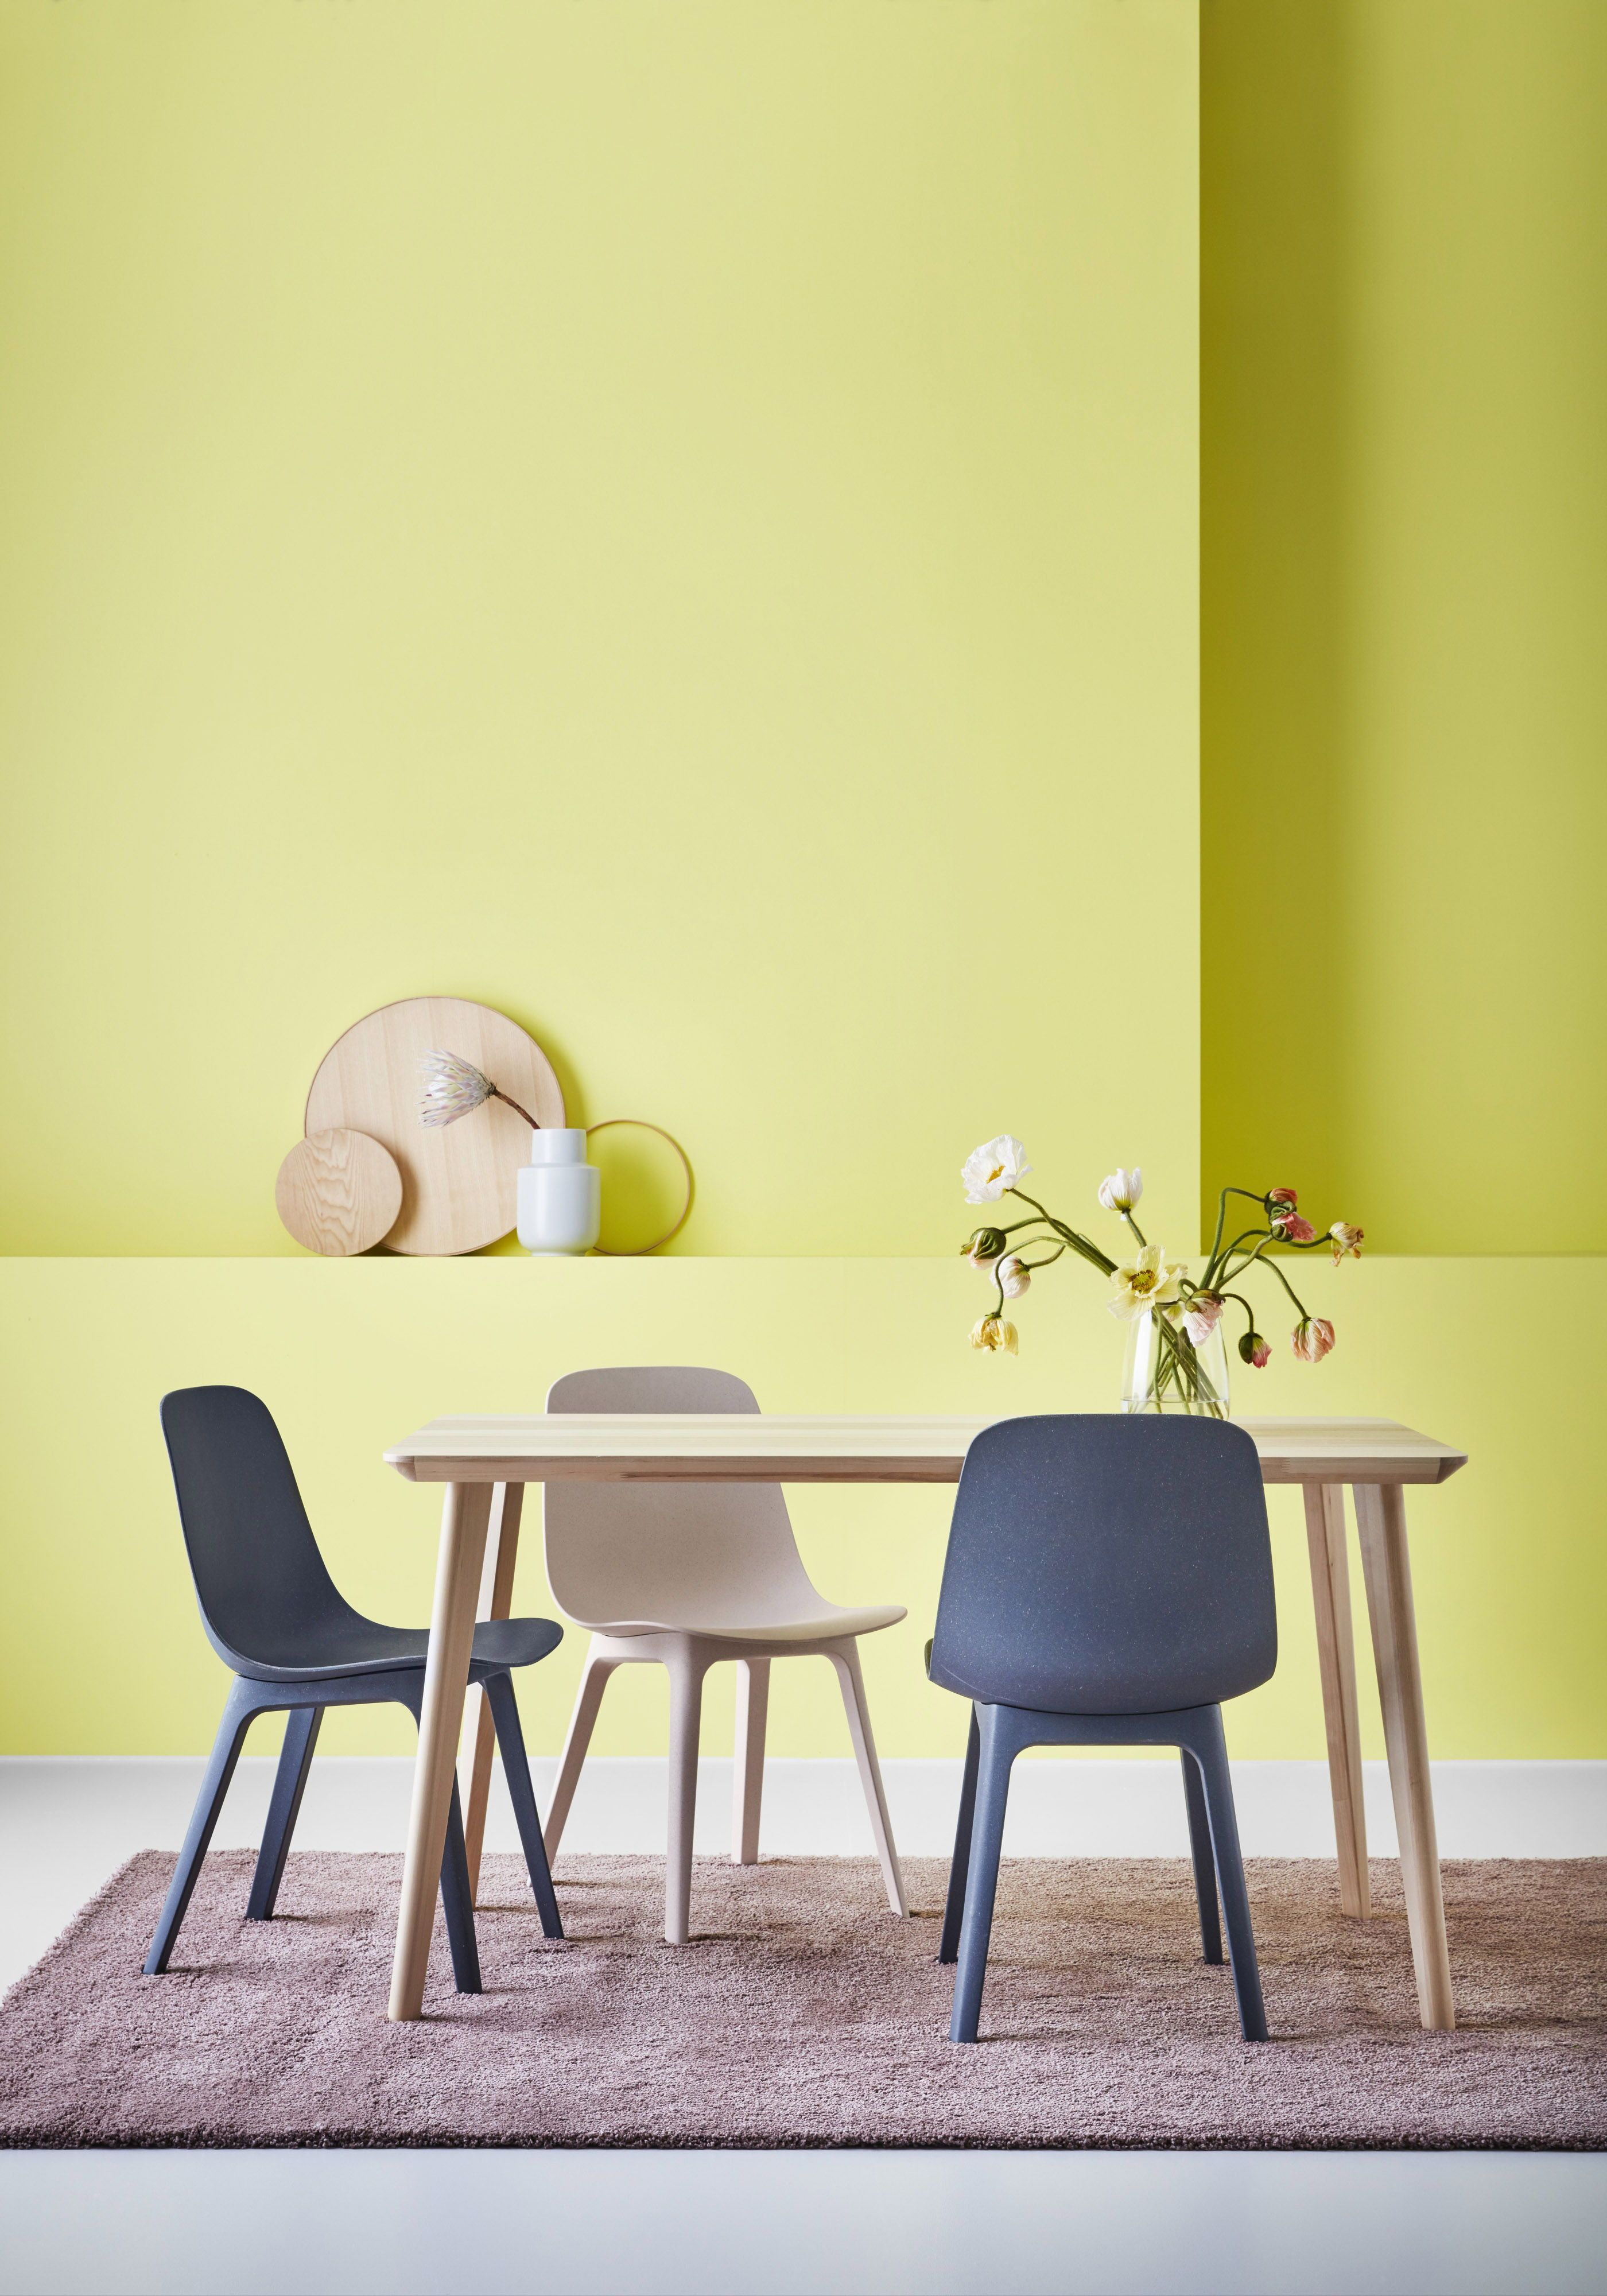 Eetkamer Stoel Ikea.Odger Eetkamerstoel Blauw In 2020 Eetkamerstoelen Ikea